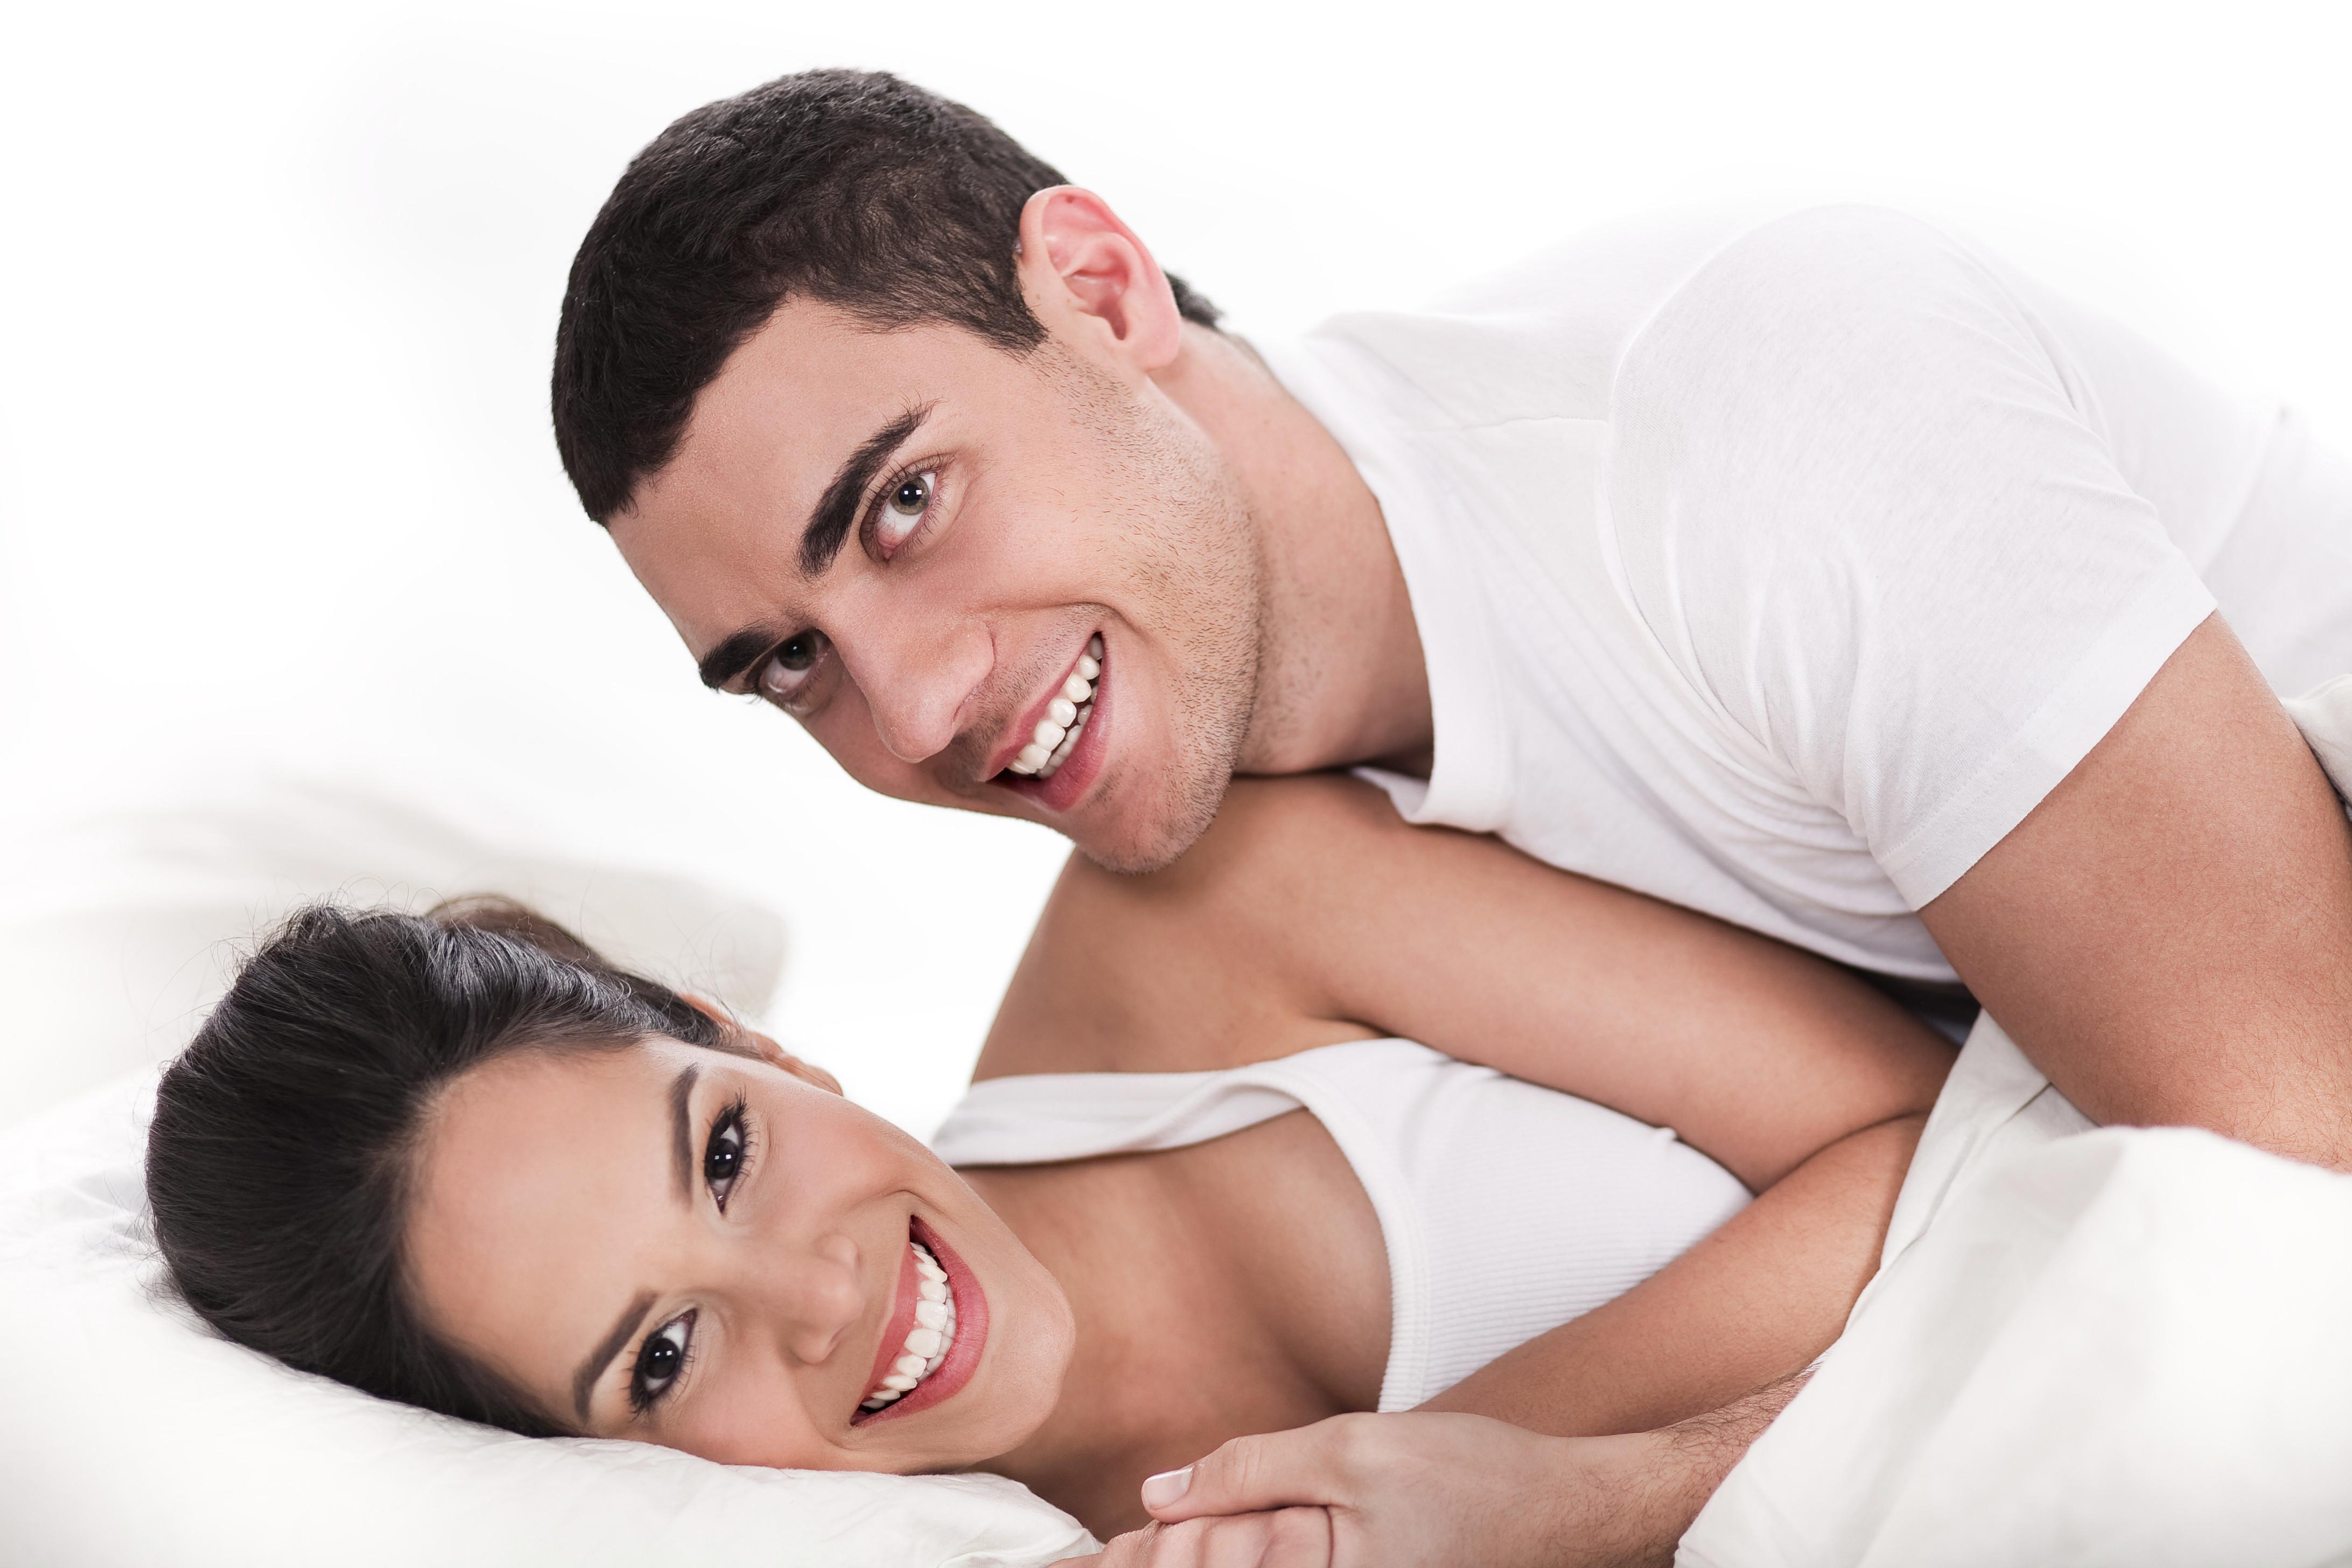 Sex 性 做愛 男女 性愛 湯匙 湯匙式 spooning (示意圖/達志影像)